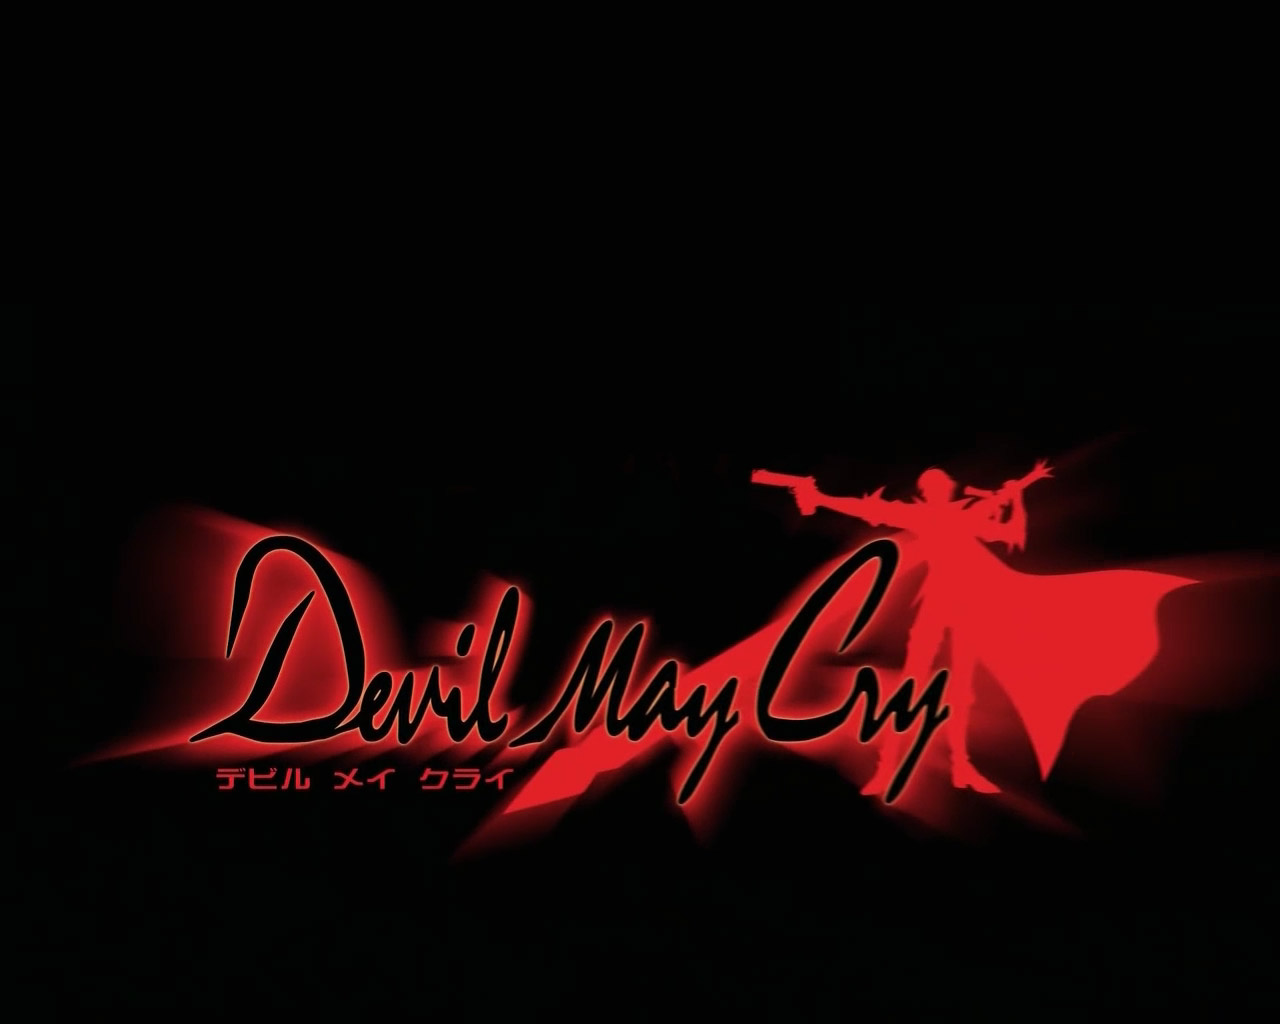 may cry demo review dmc devil may cry fact sheet far cry 3 wallpaper 1280x1024